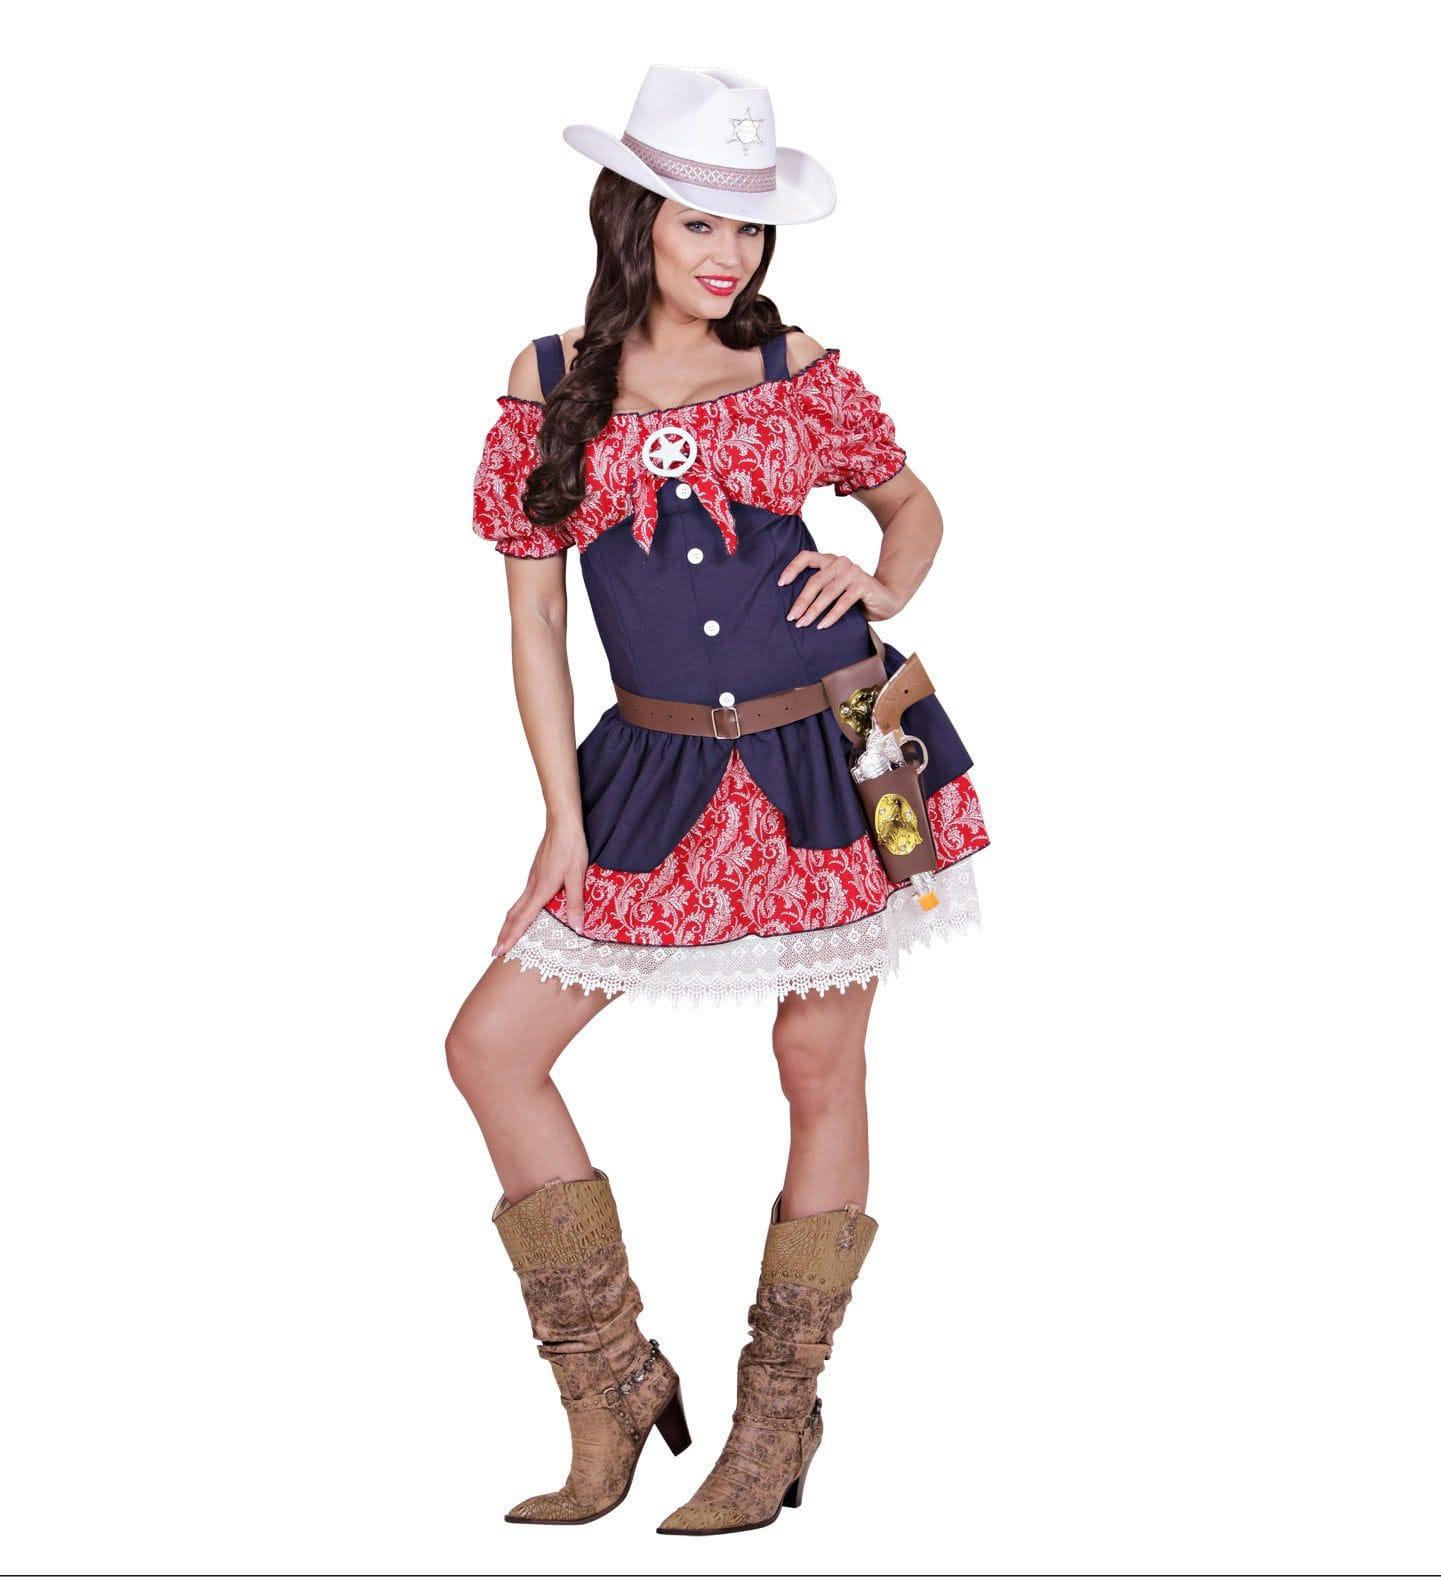 Linedancing Cowgirl Vrouw Kostuum